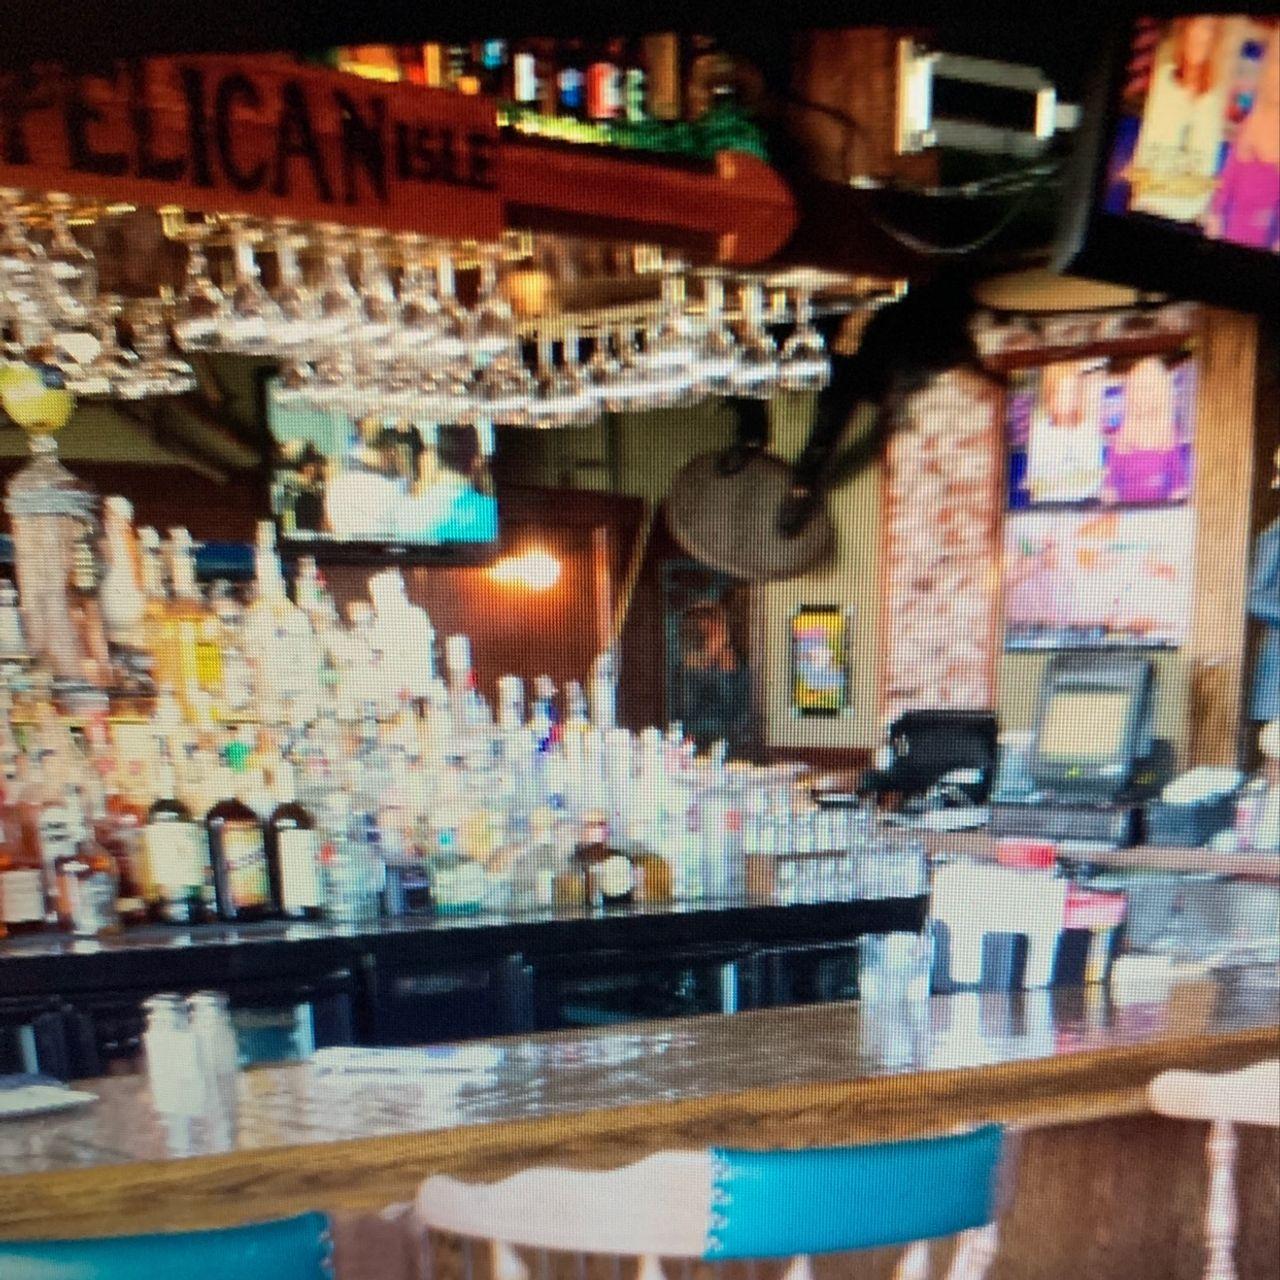 Pelican Isle Restaurant and Bar